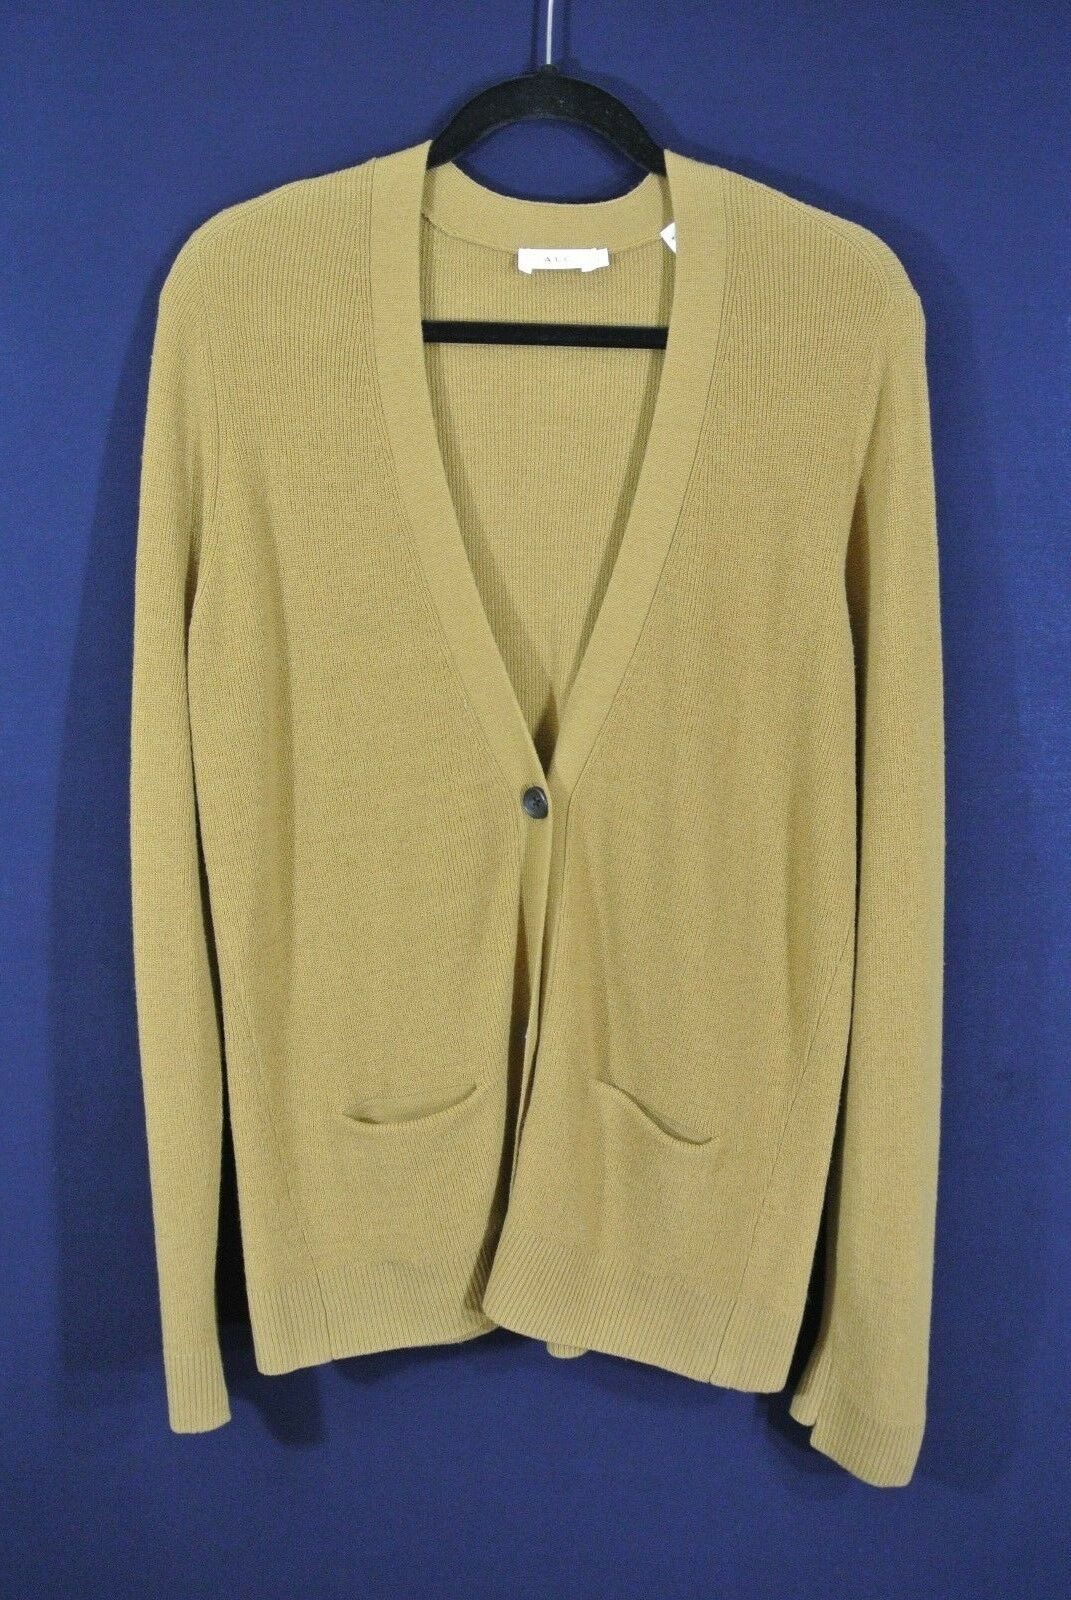 NEW A.L.C.Phillip Merino Merino Merino Wool Blend Cardigan in Toffee - Size L  396 ade3f2